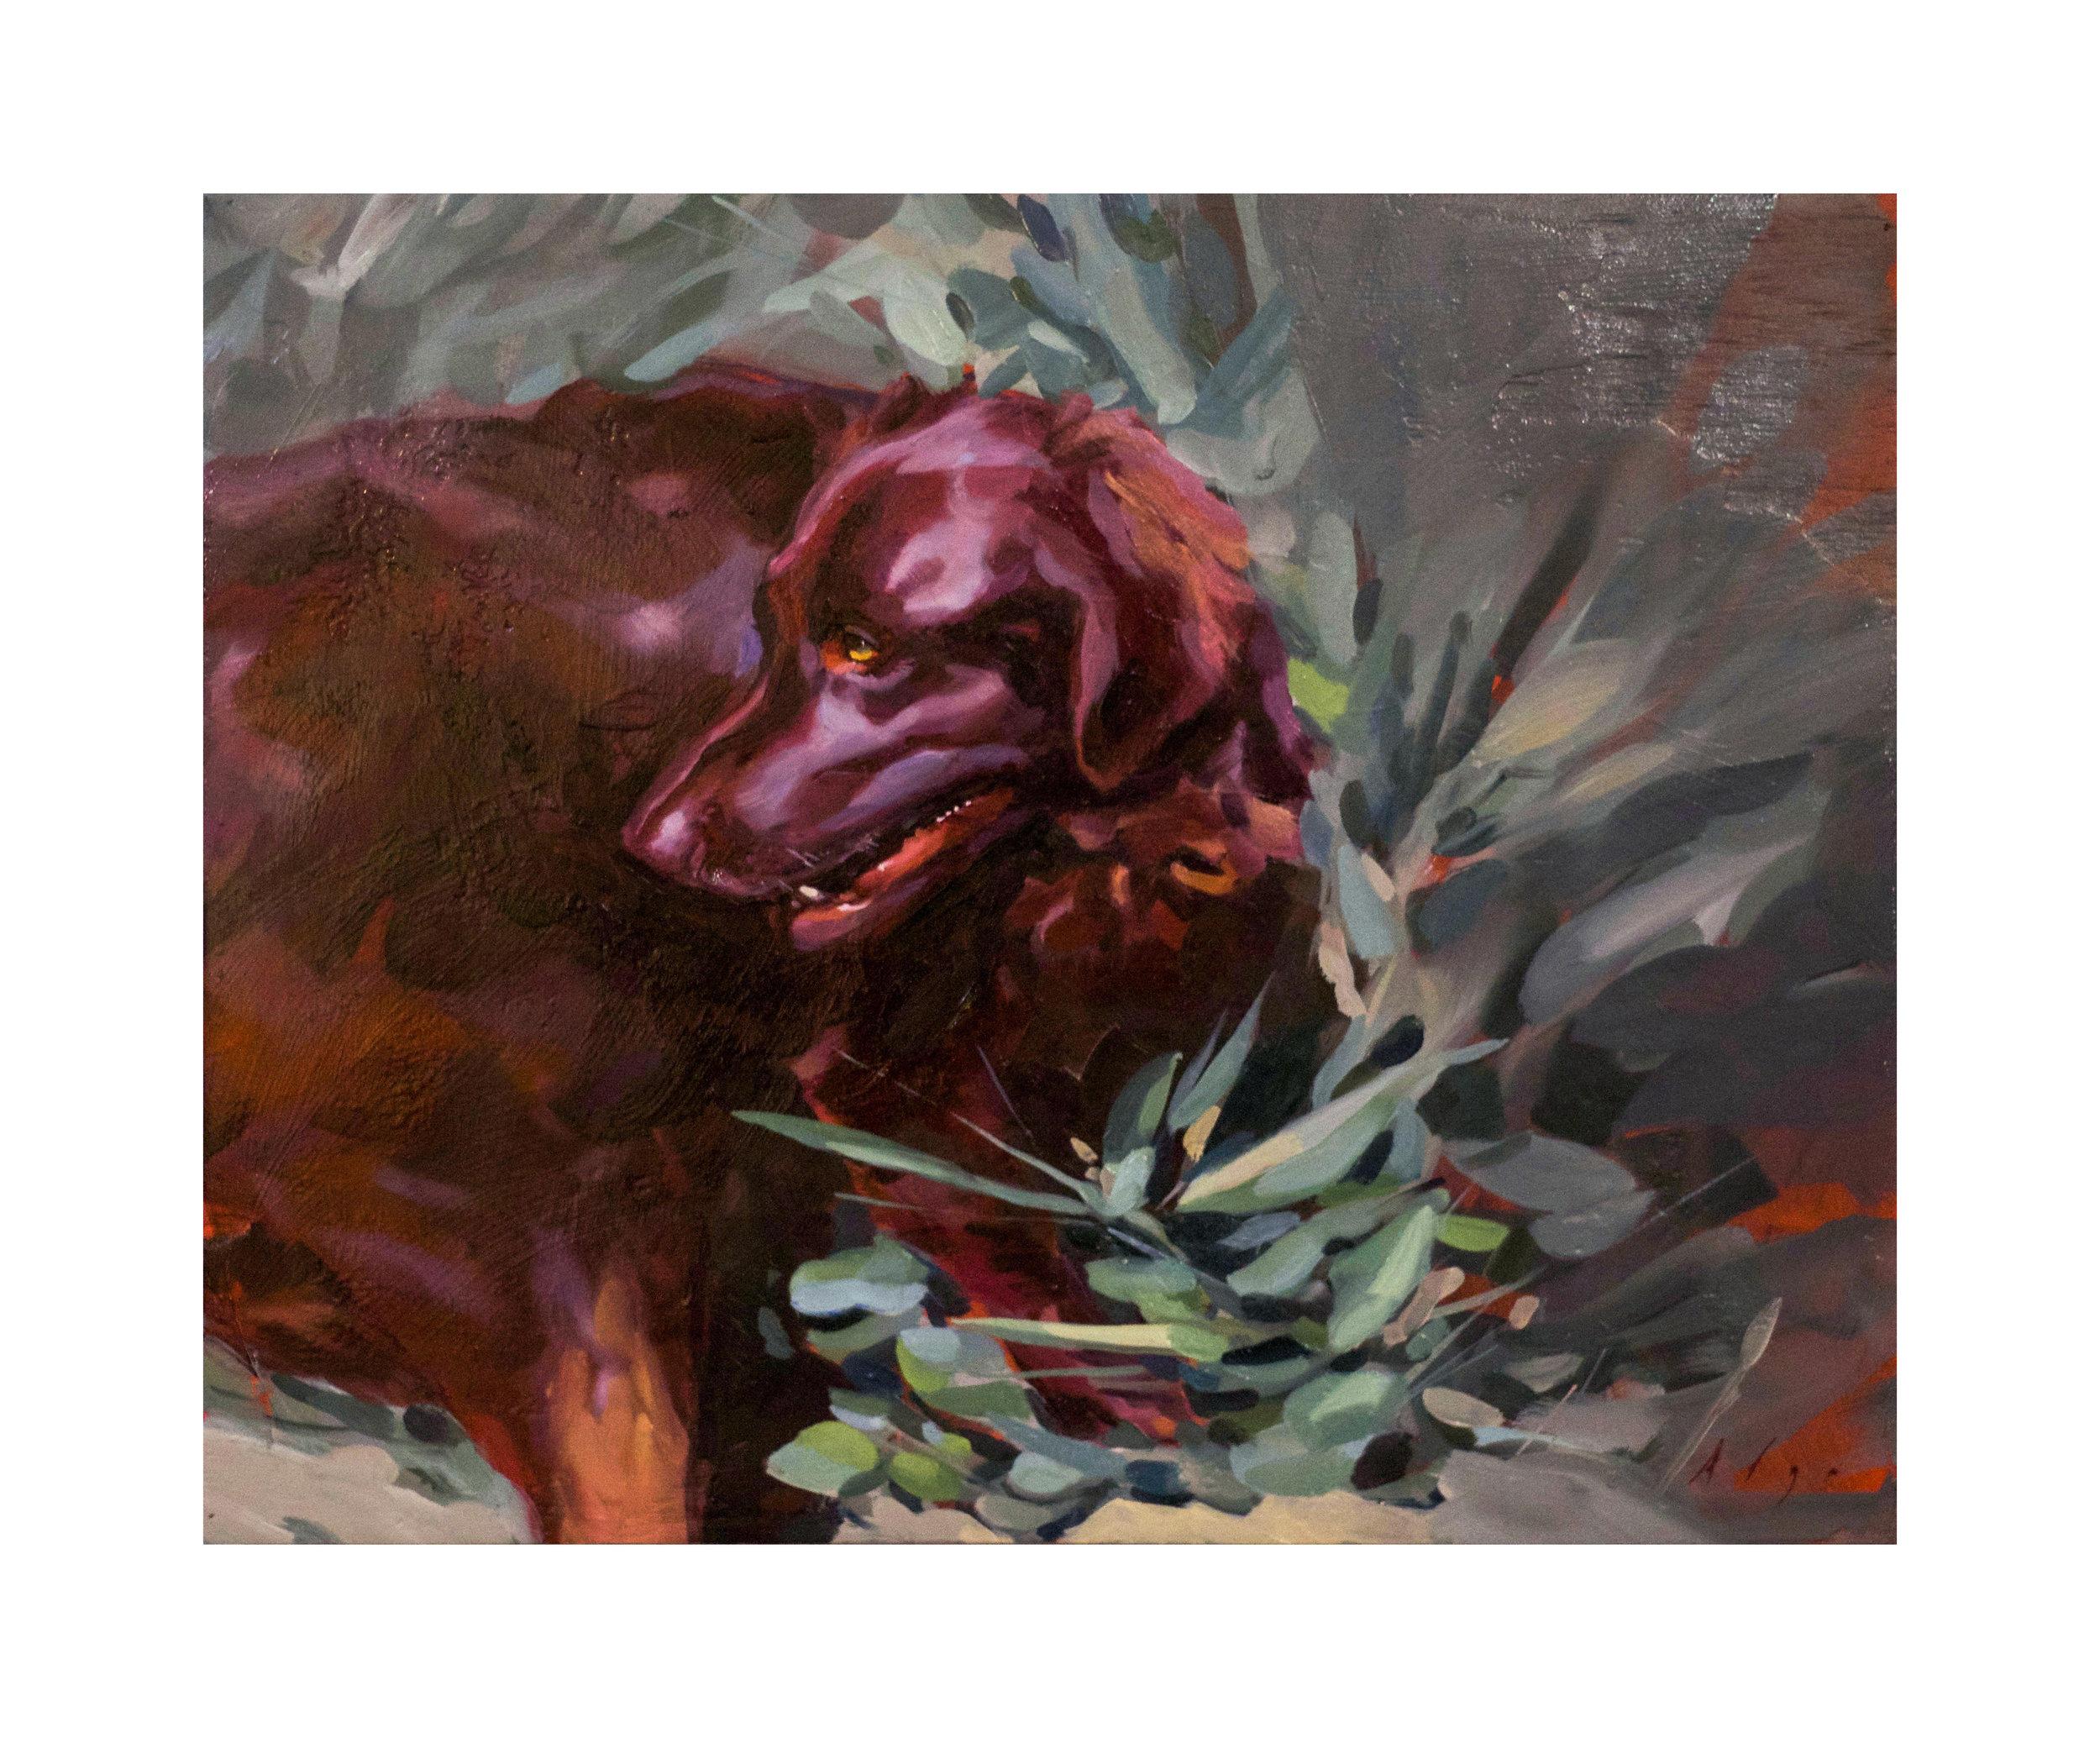 Viryachev, Ilya - Dog with a Big Heart_16x20_oilonwood_1000.jpg